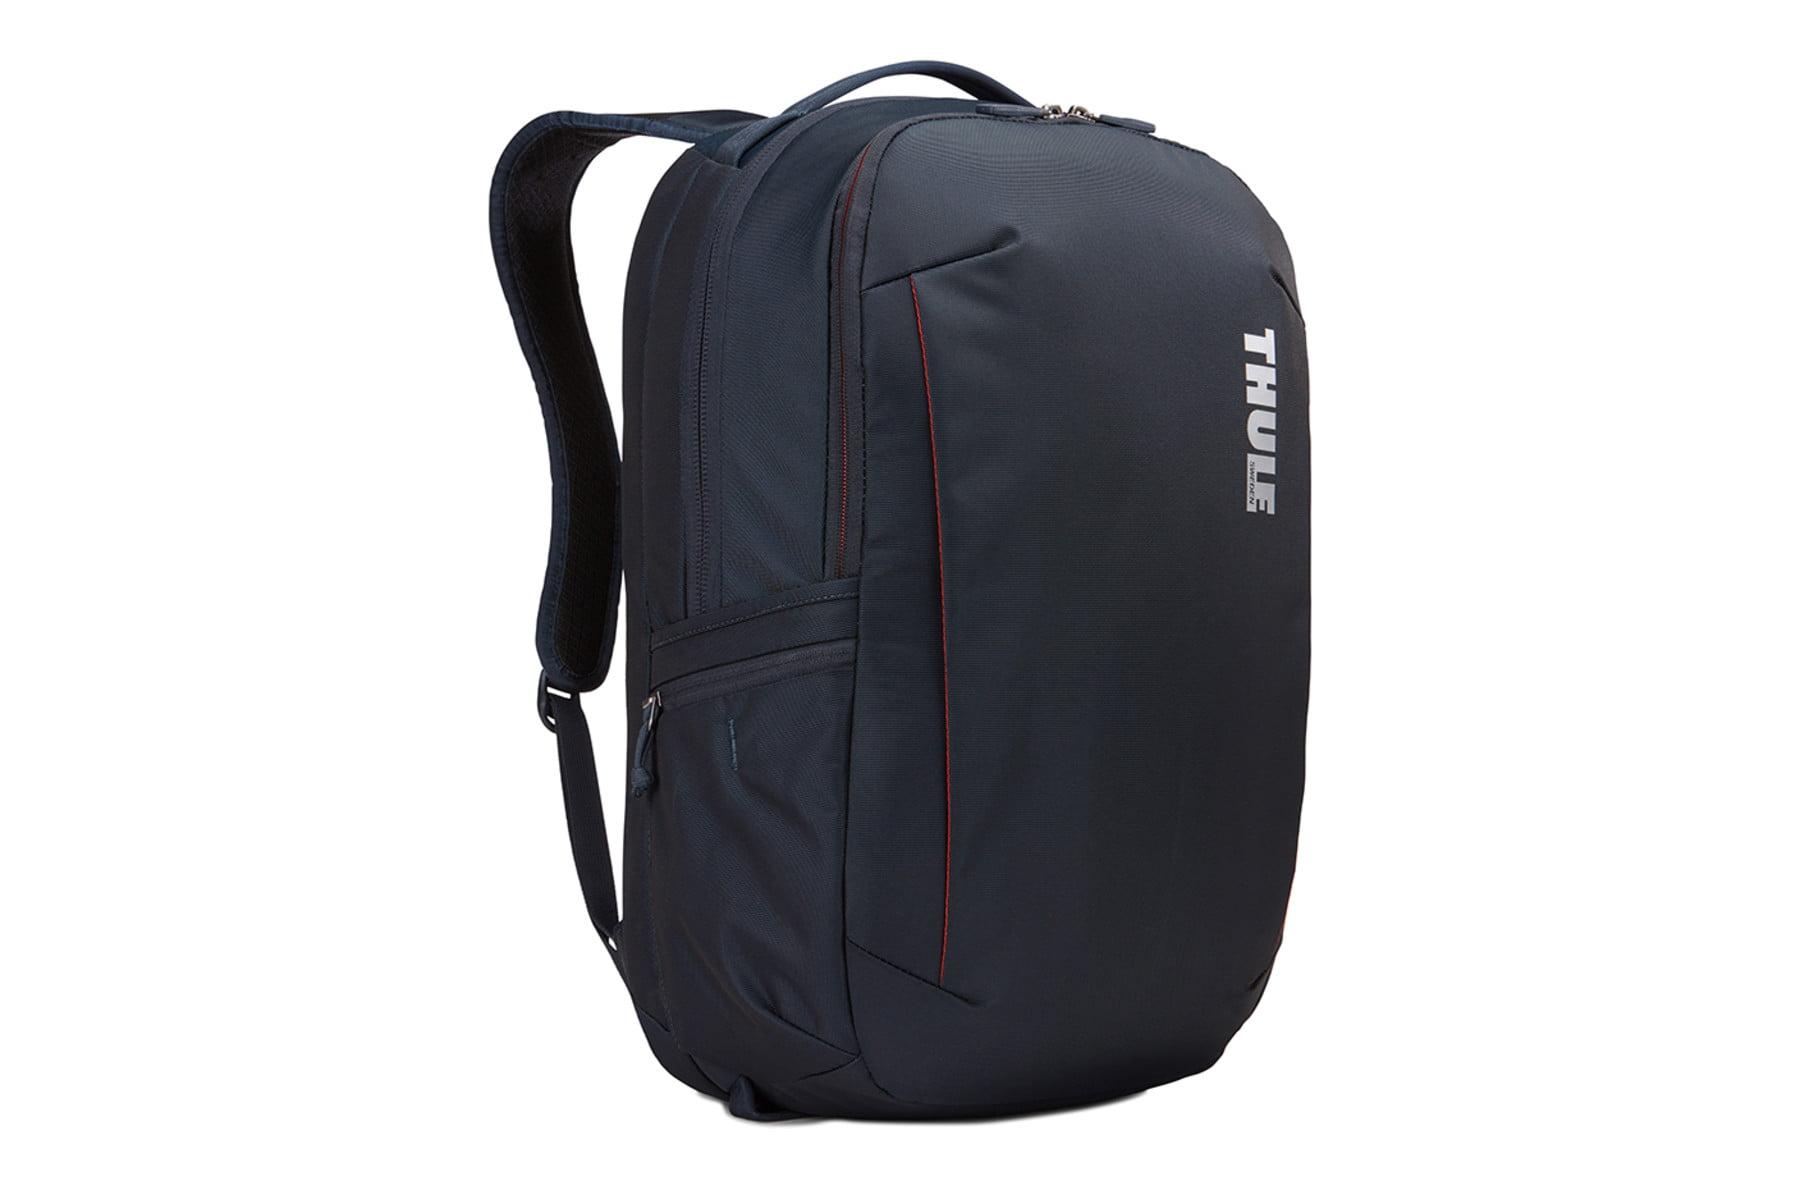 Rucsac urban cu compartiment laptop Thule Subterra Backpack 30L Mineral